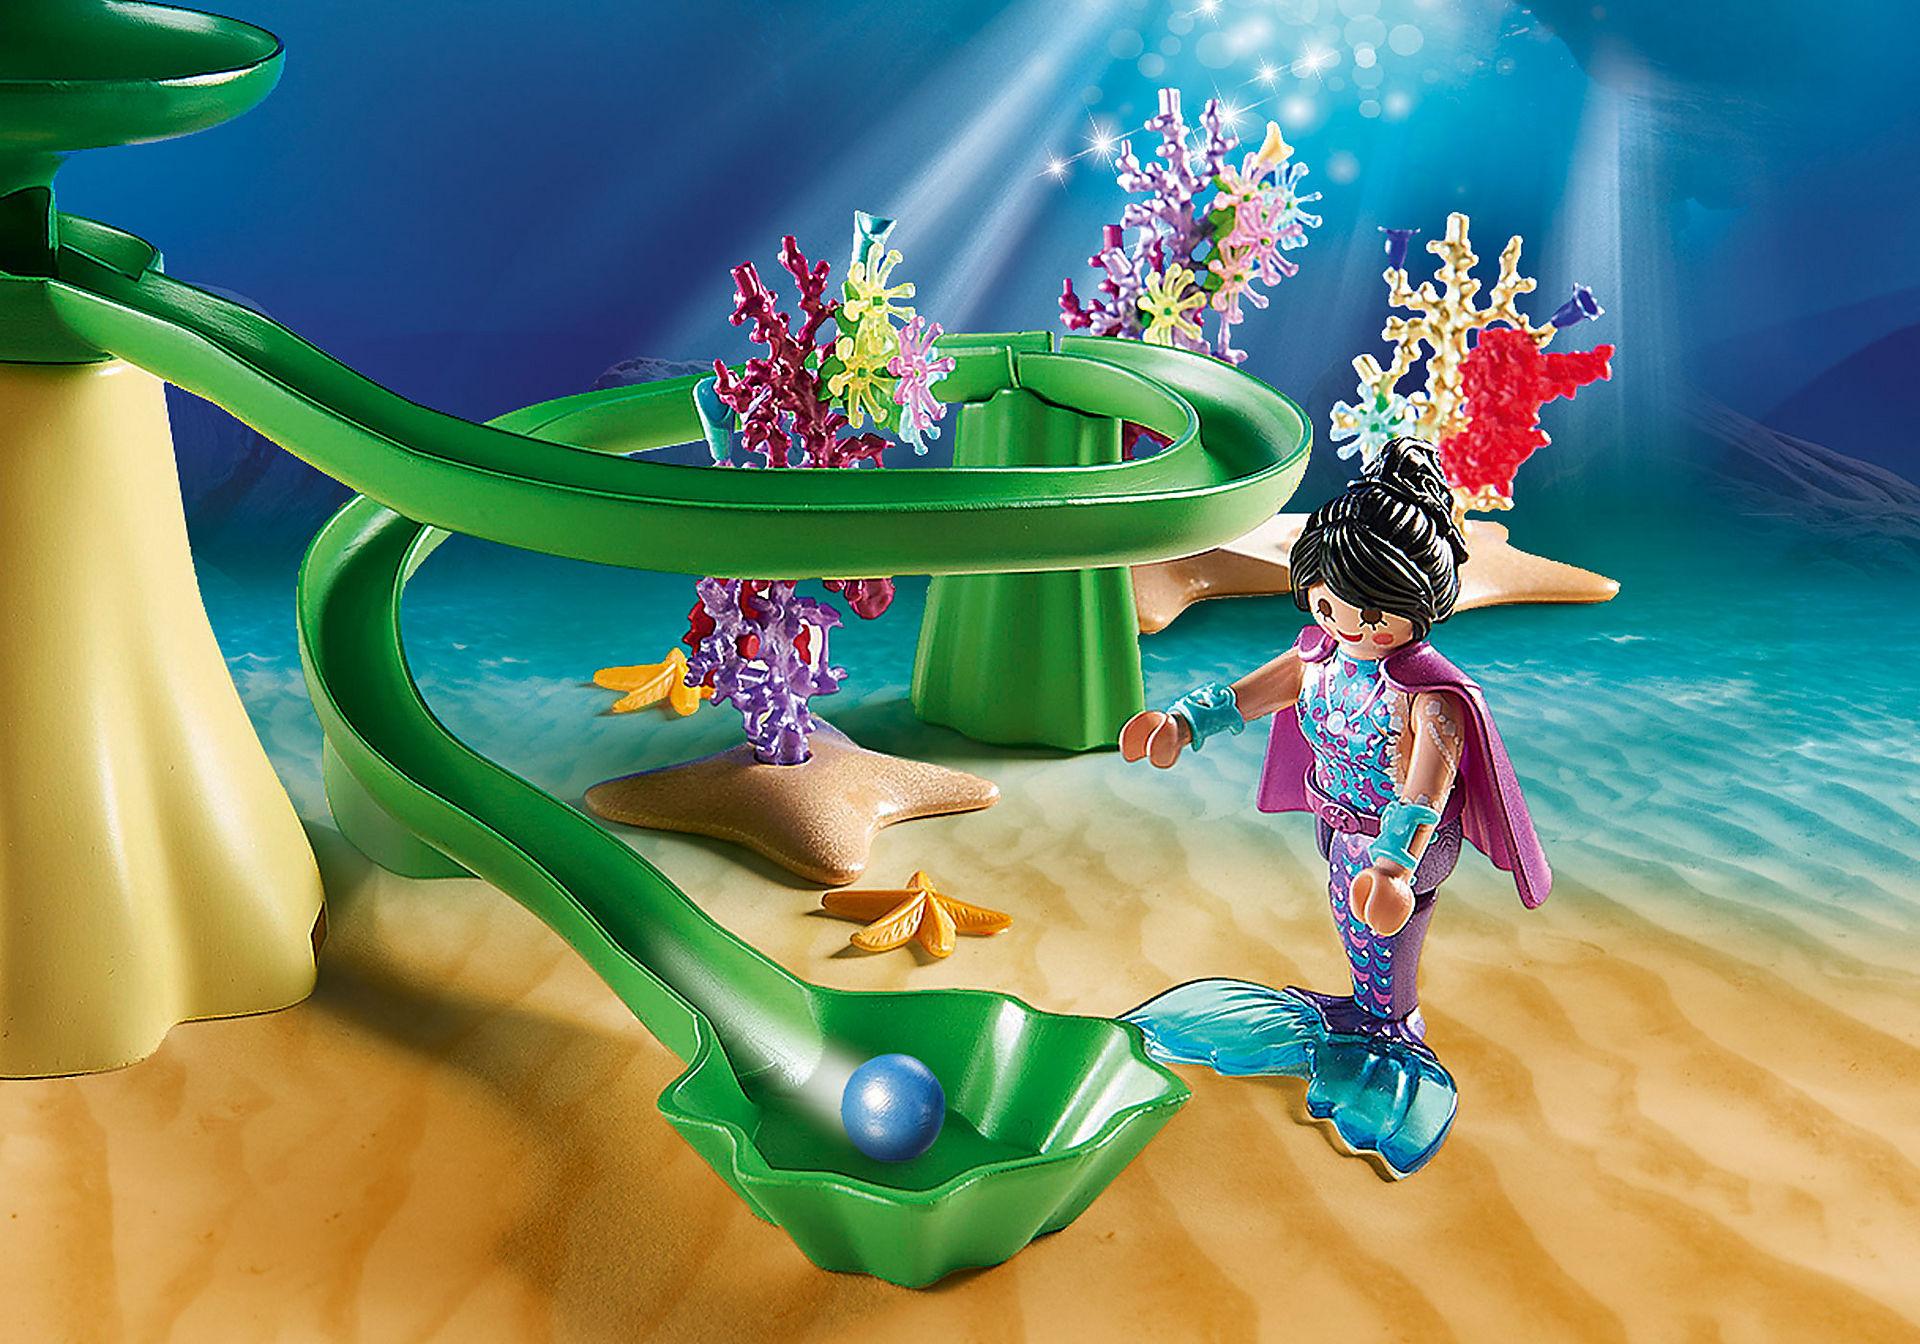 70094 Mermaid Cove with Illuminated Dome zoom image5